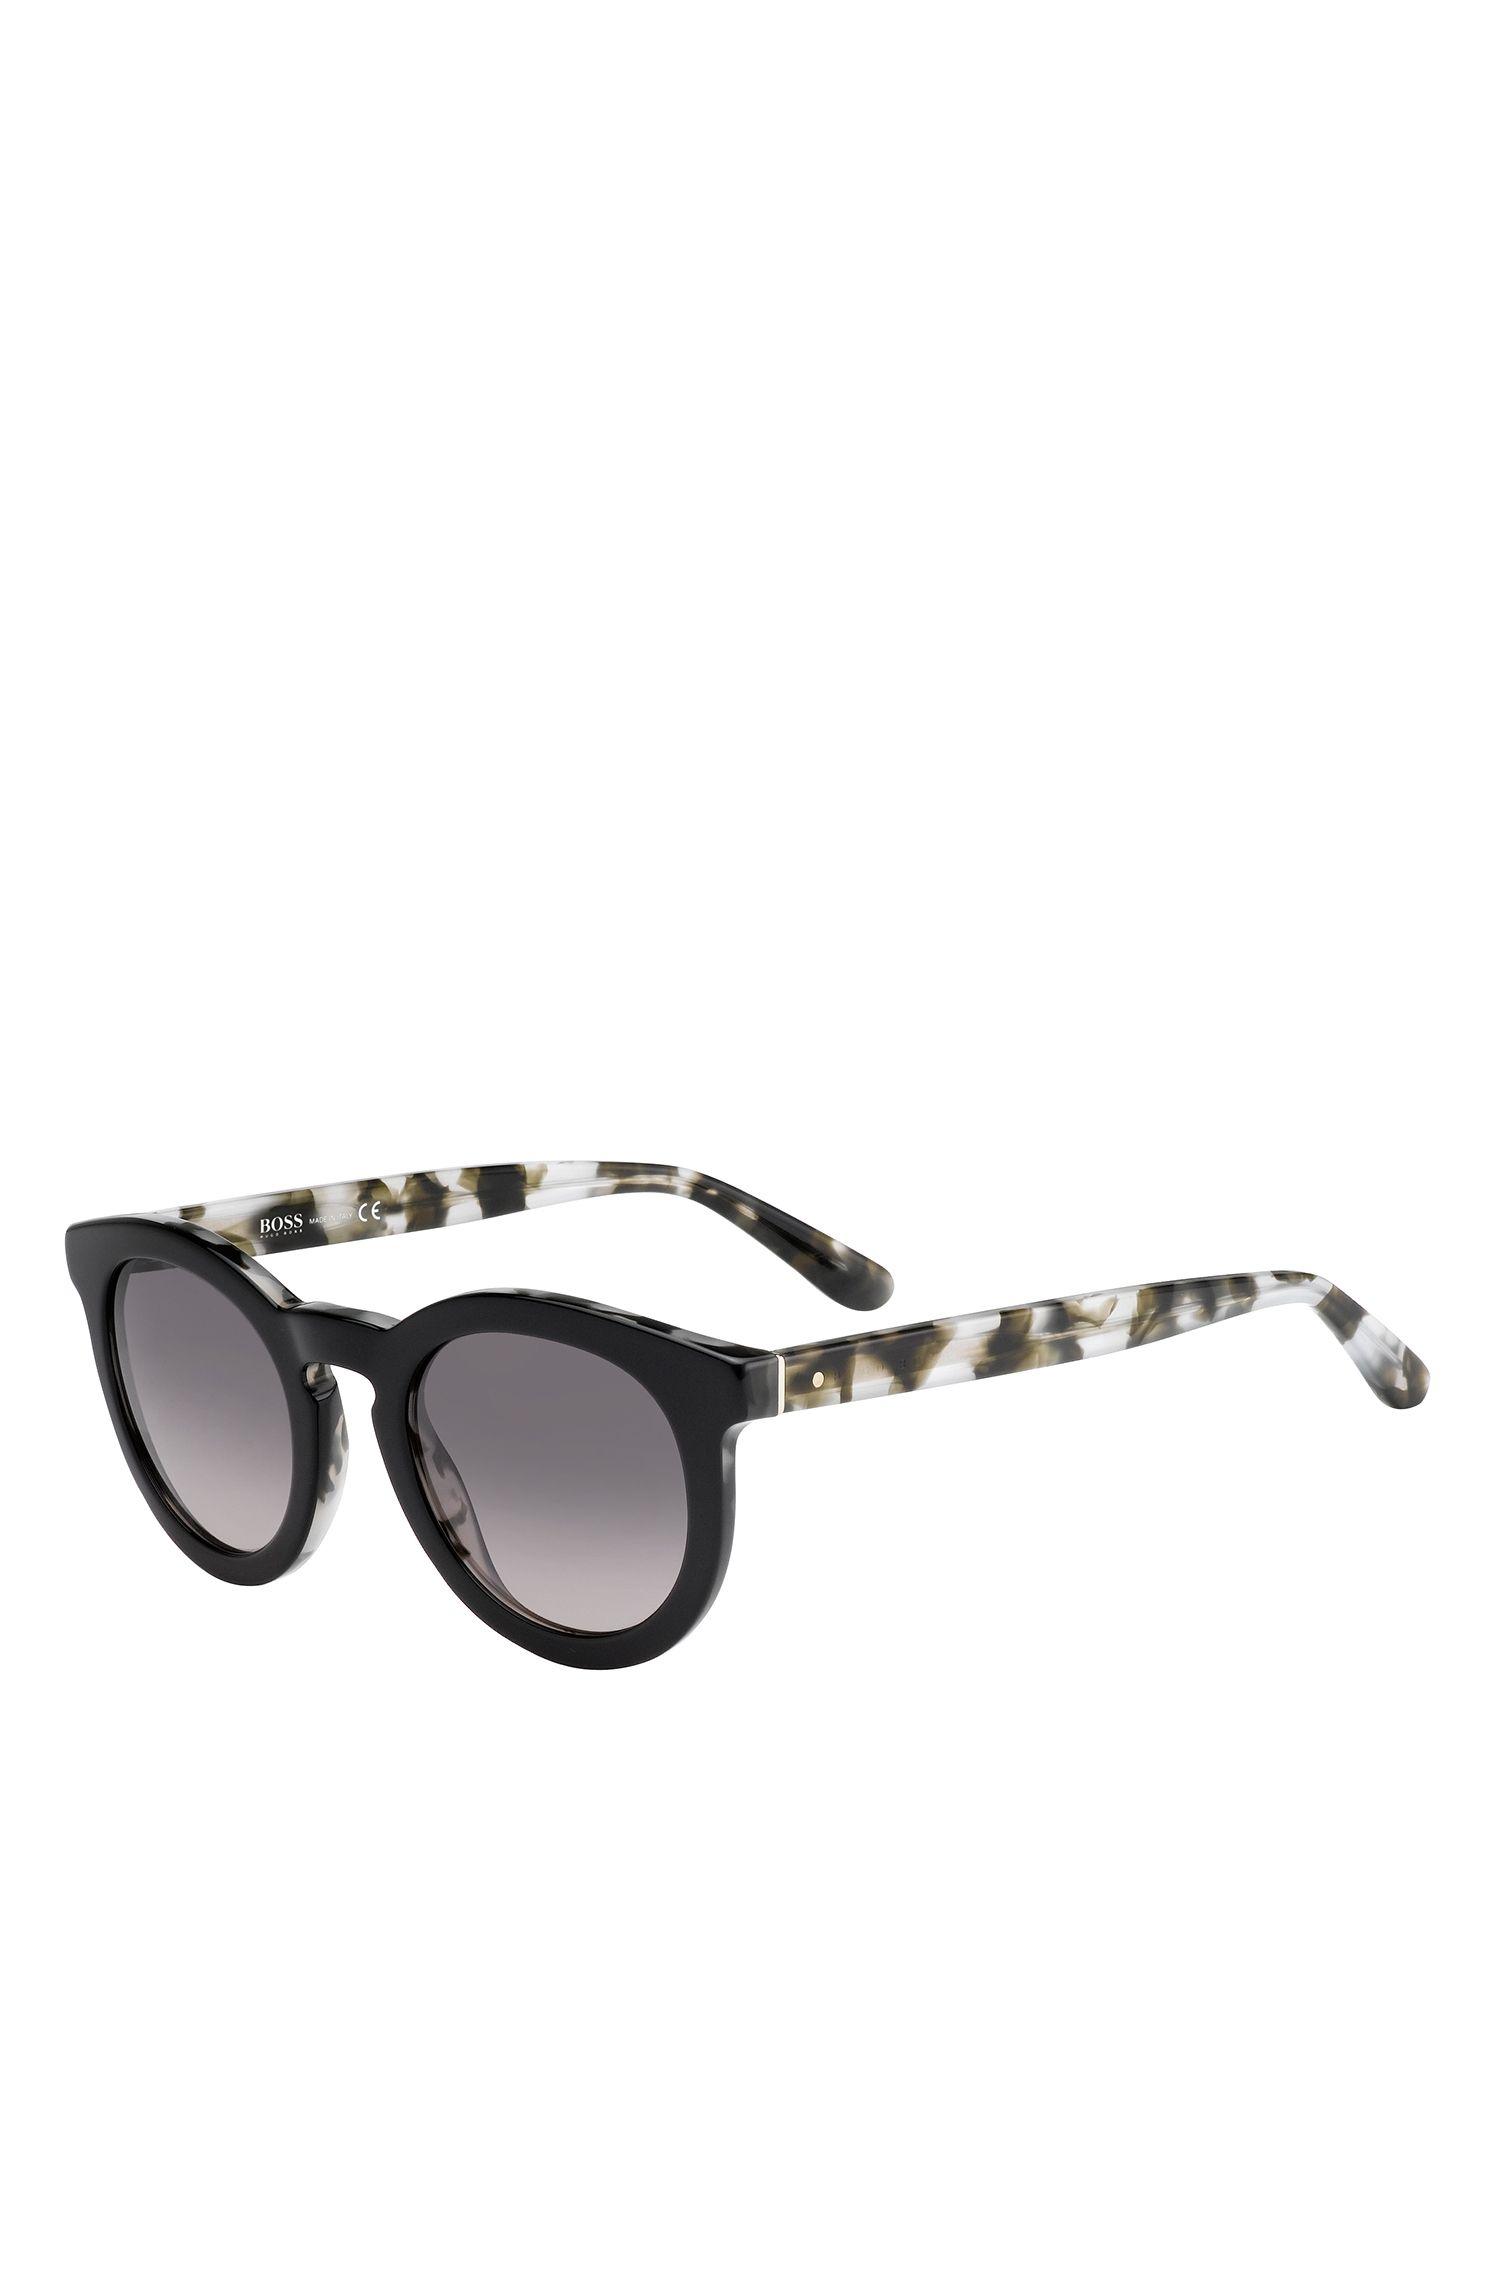 Gradient Lenses Roud Cateye Sunglasses | BOSS 0742S